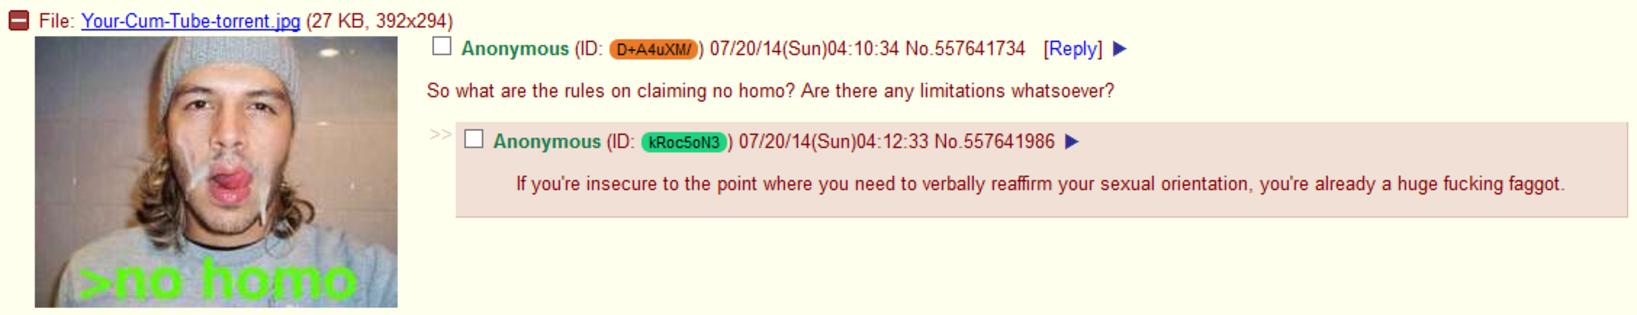 4chan torrent